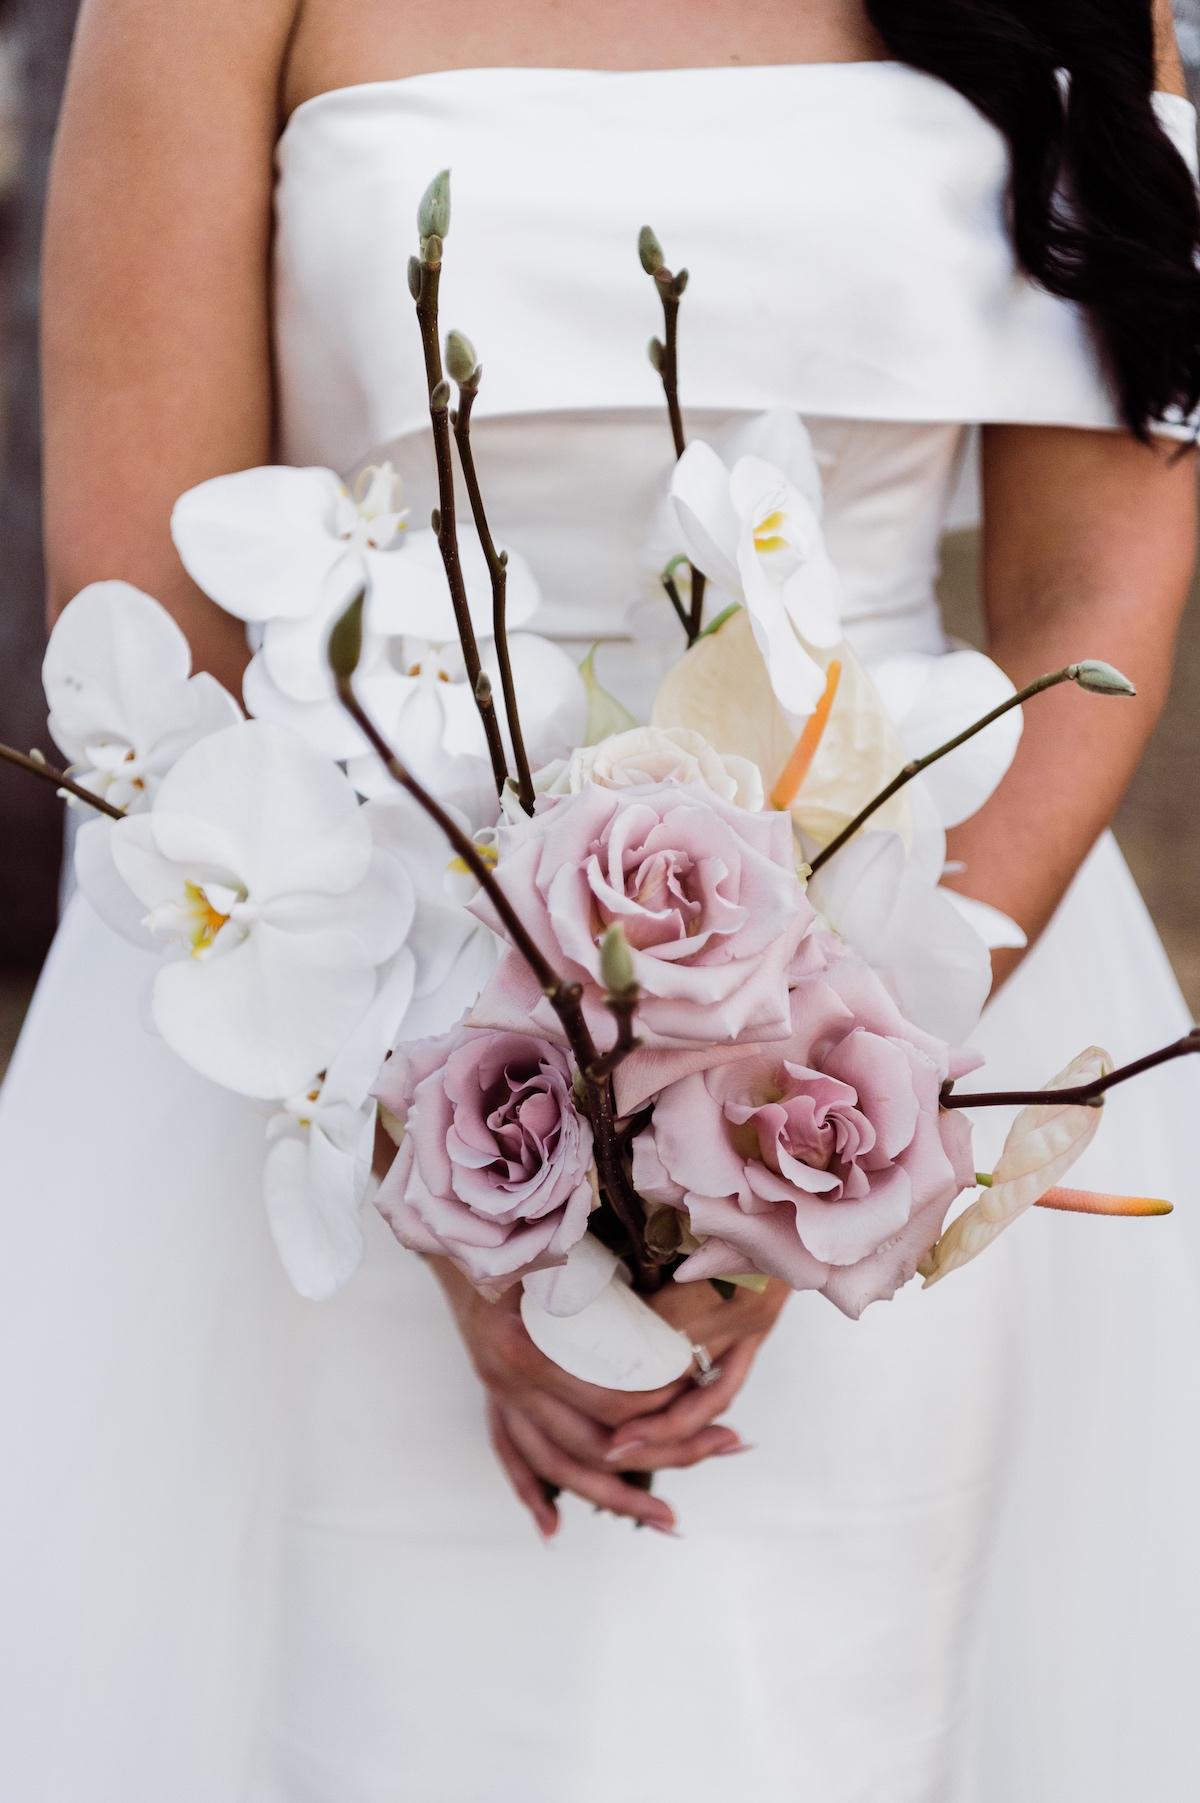 brides bouquet of orchids, anthuriums and phalenopsis orchids